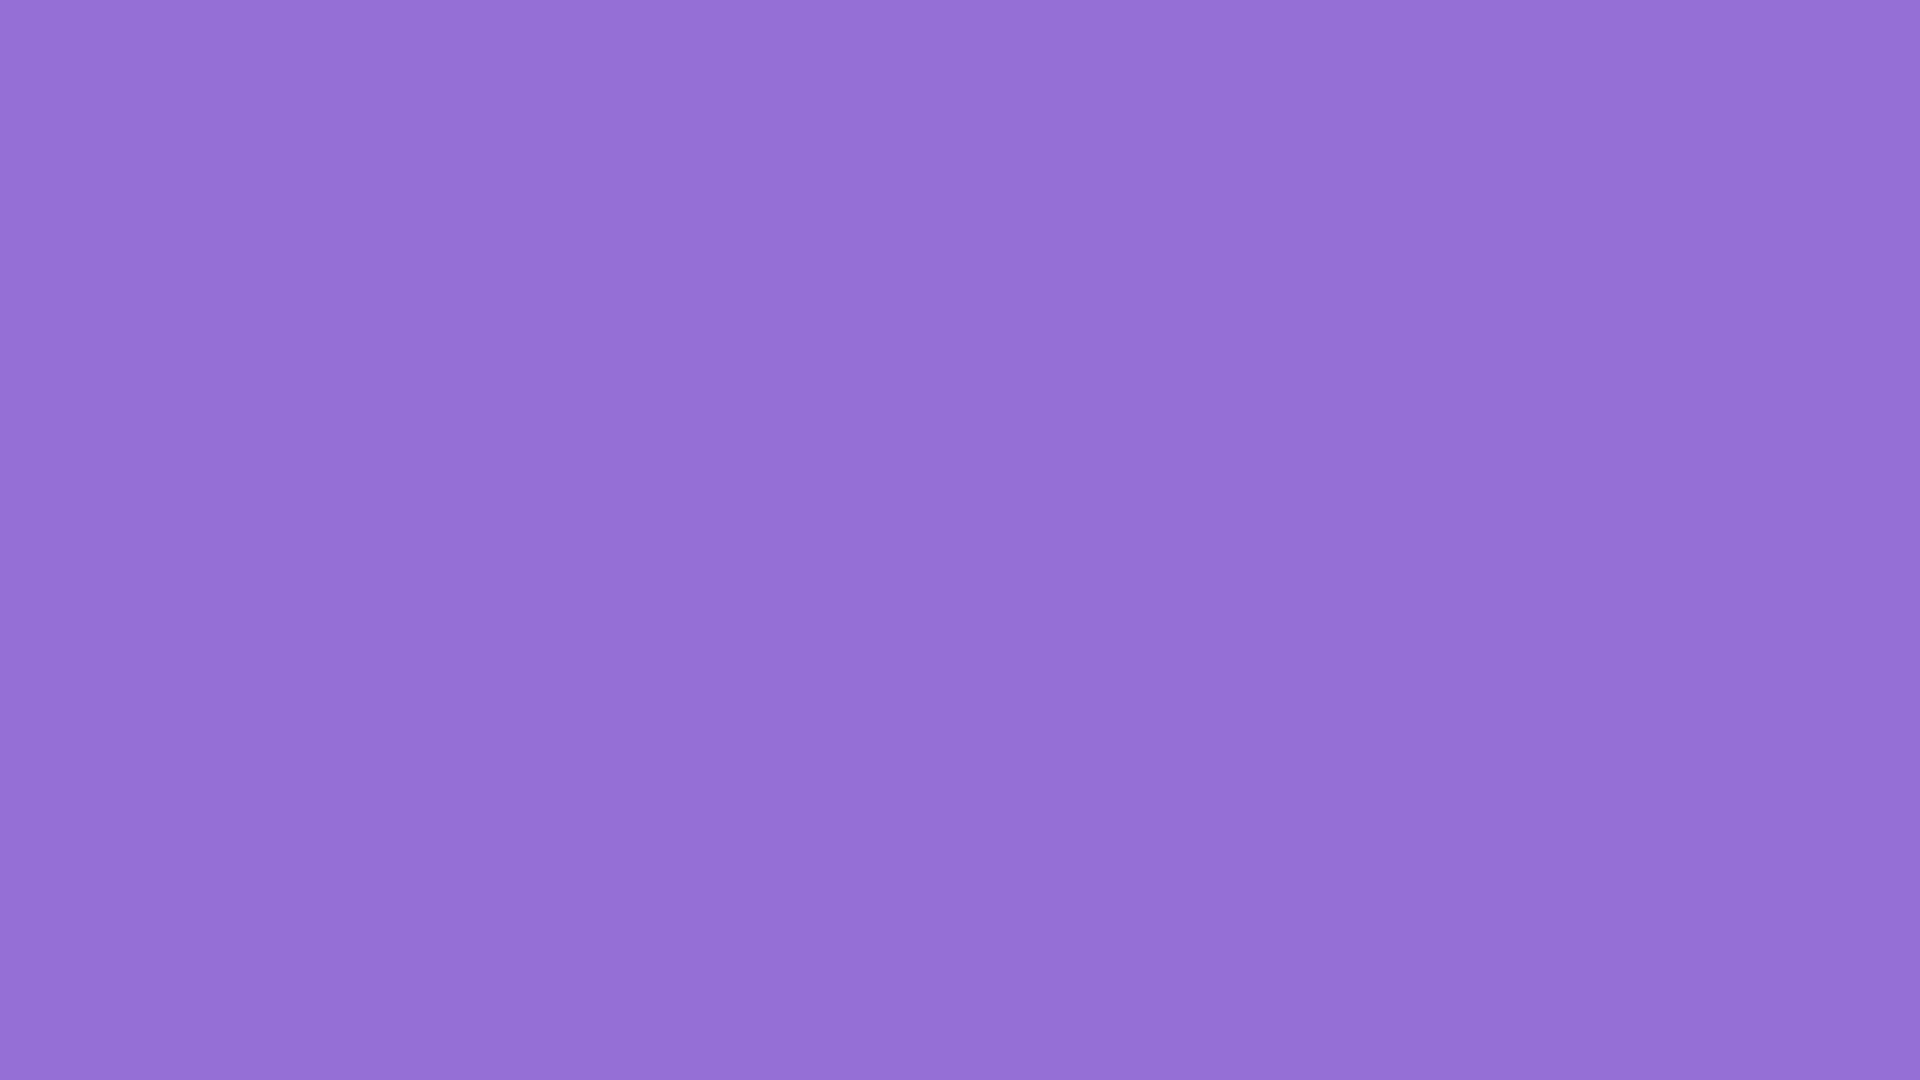 Pastel Purple Wallpaper Iphone - Scerbos com